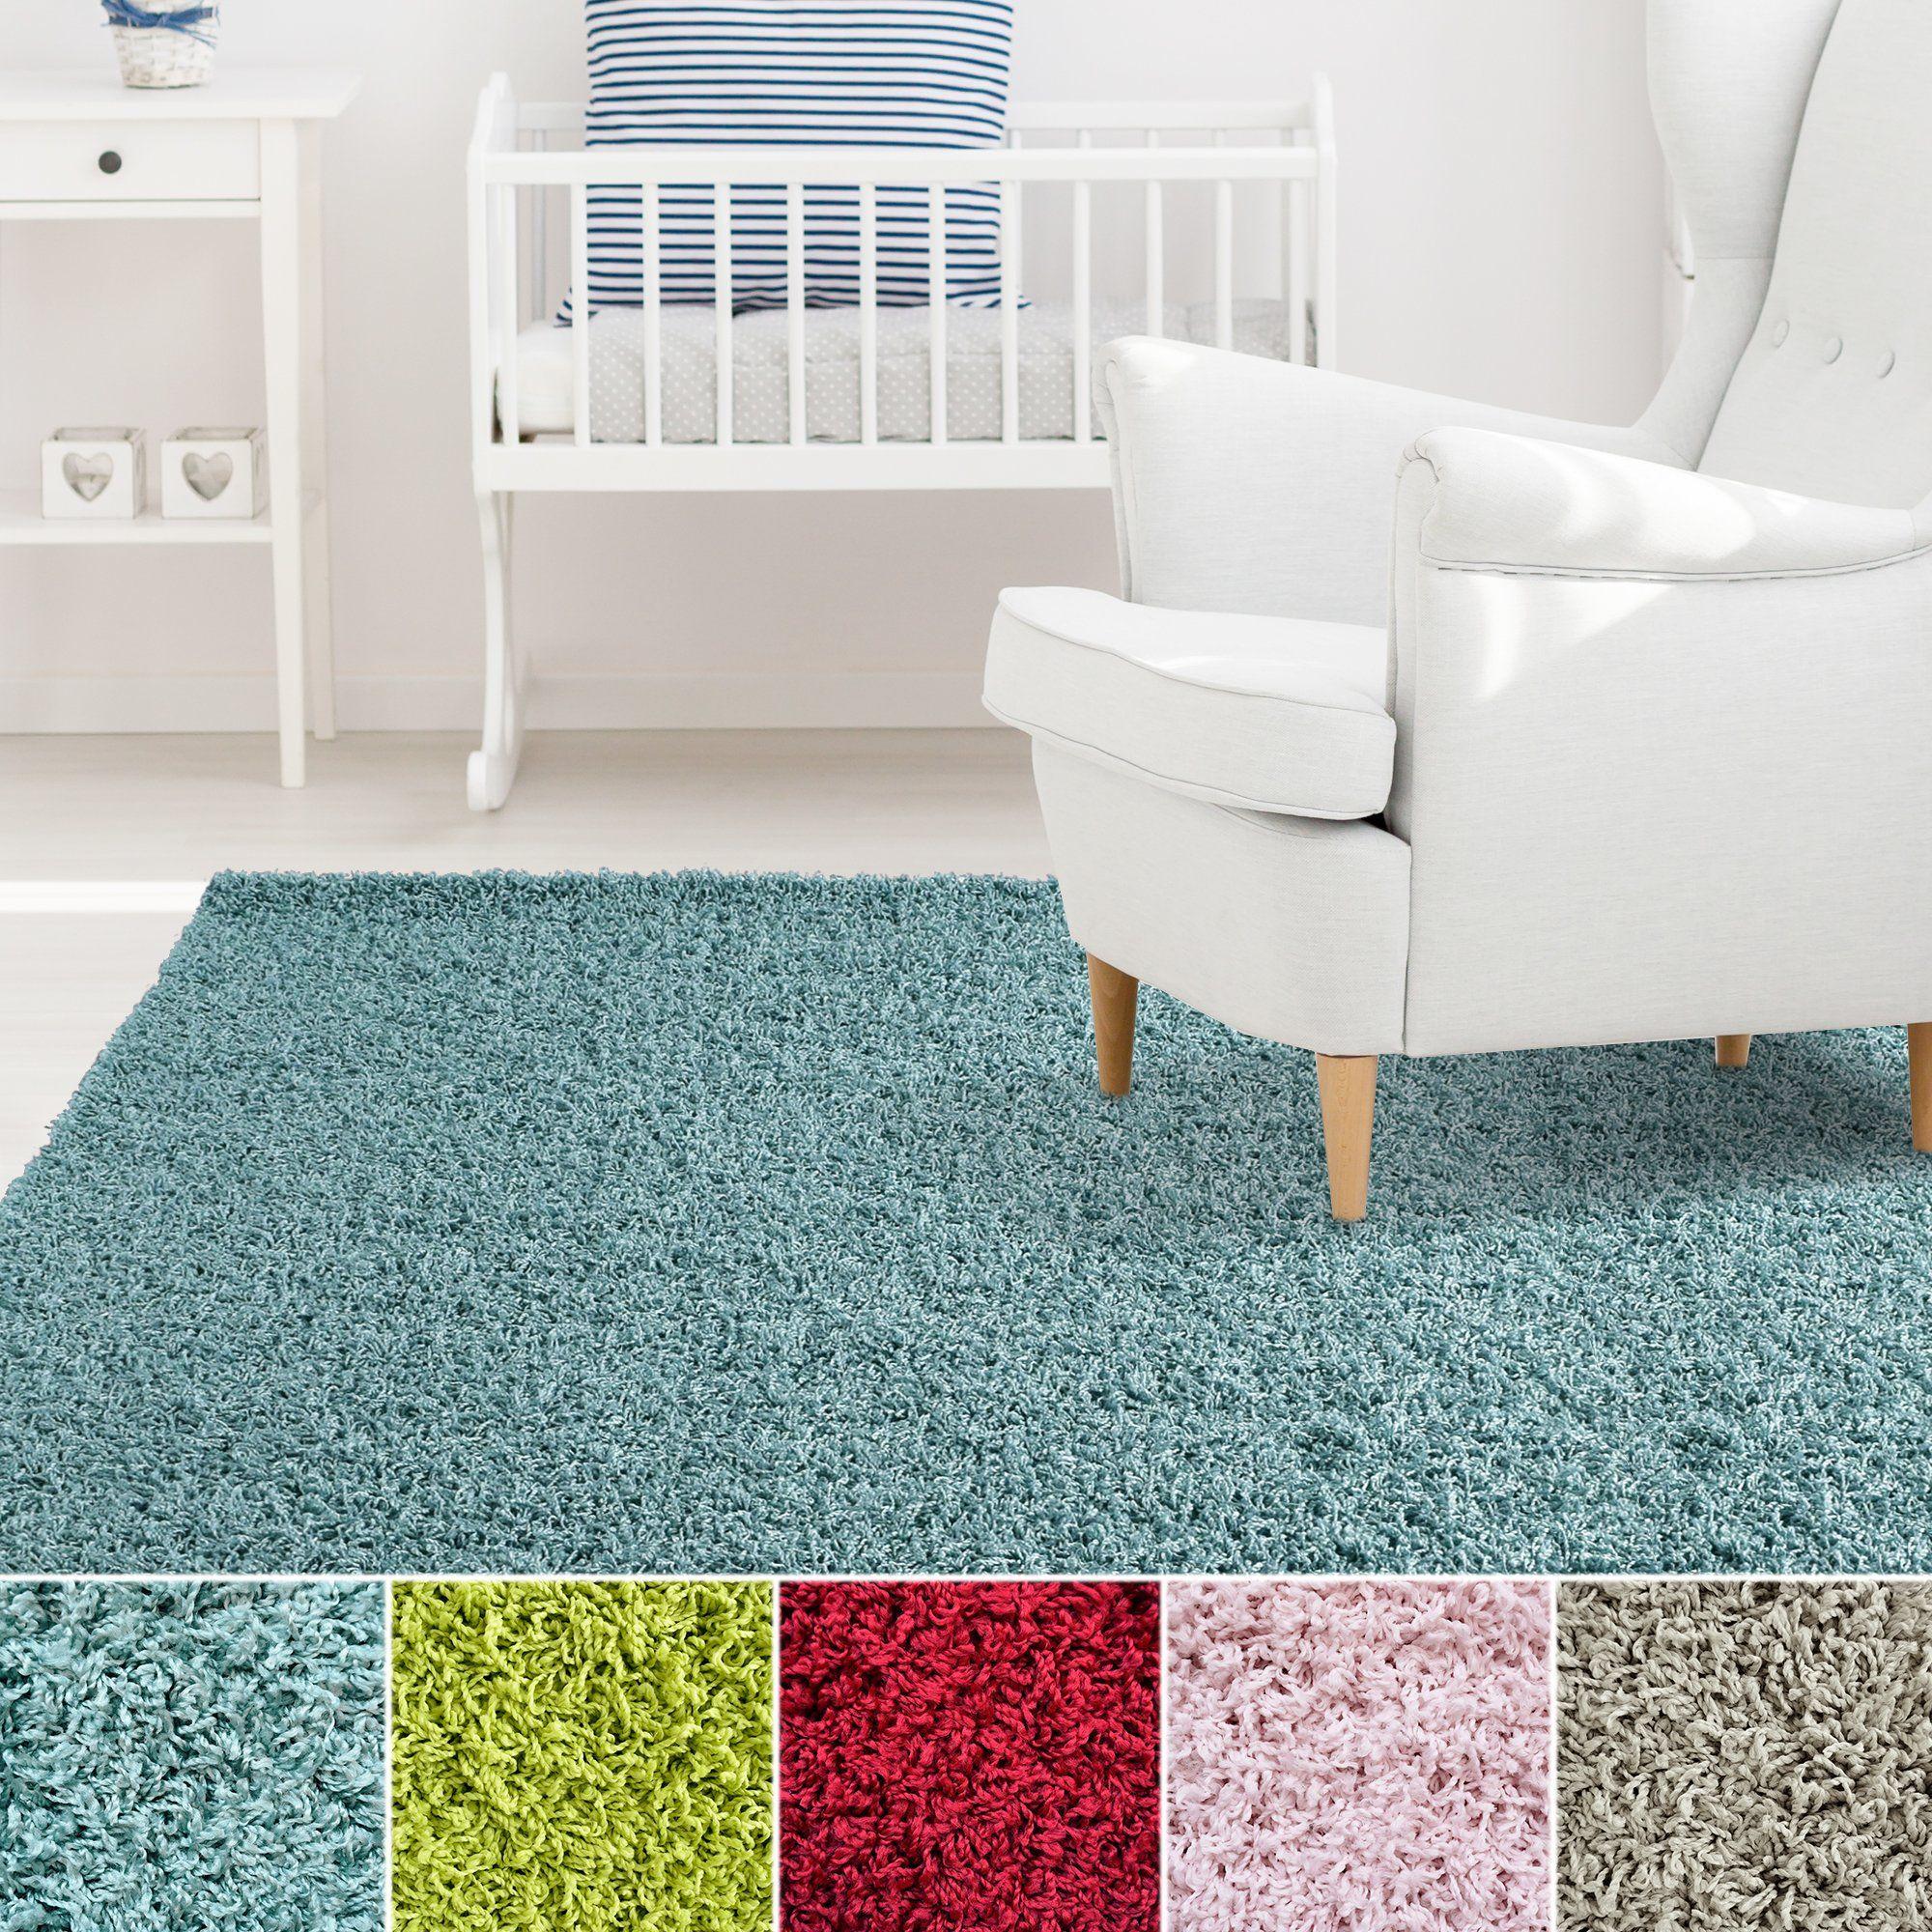 Full Size of Soft Teppich Grn Regal Kinderzimmer Weiß Wohnzimmer Teppiche Sofa Regale Kinderzimmer Teppiche Kinderzimmer